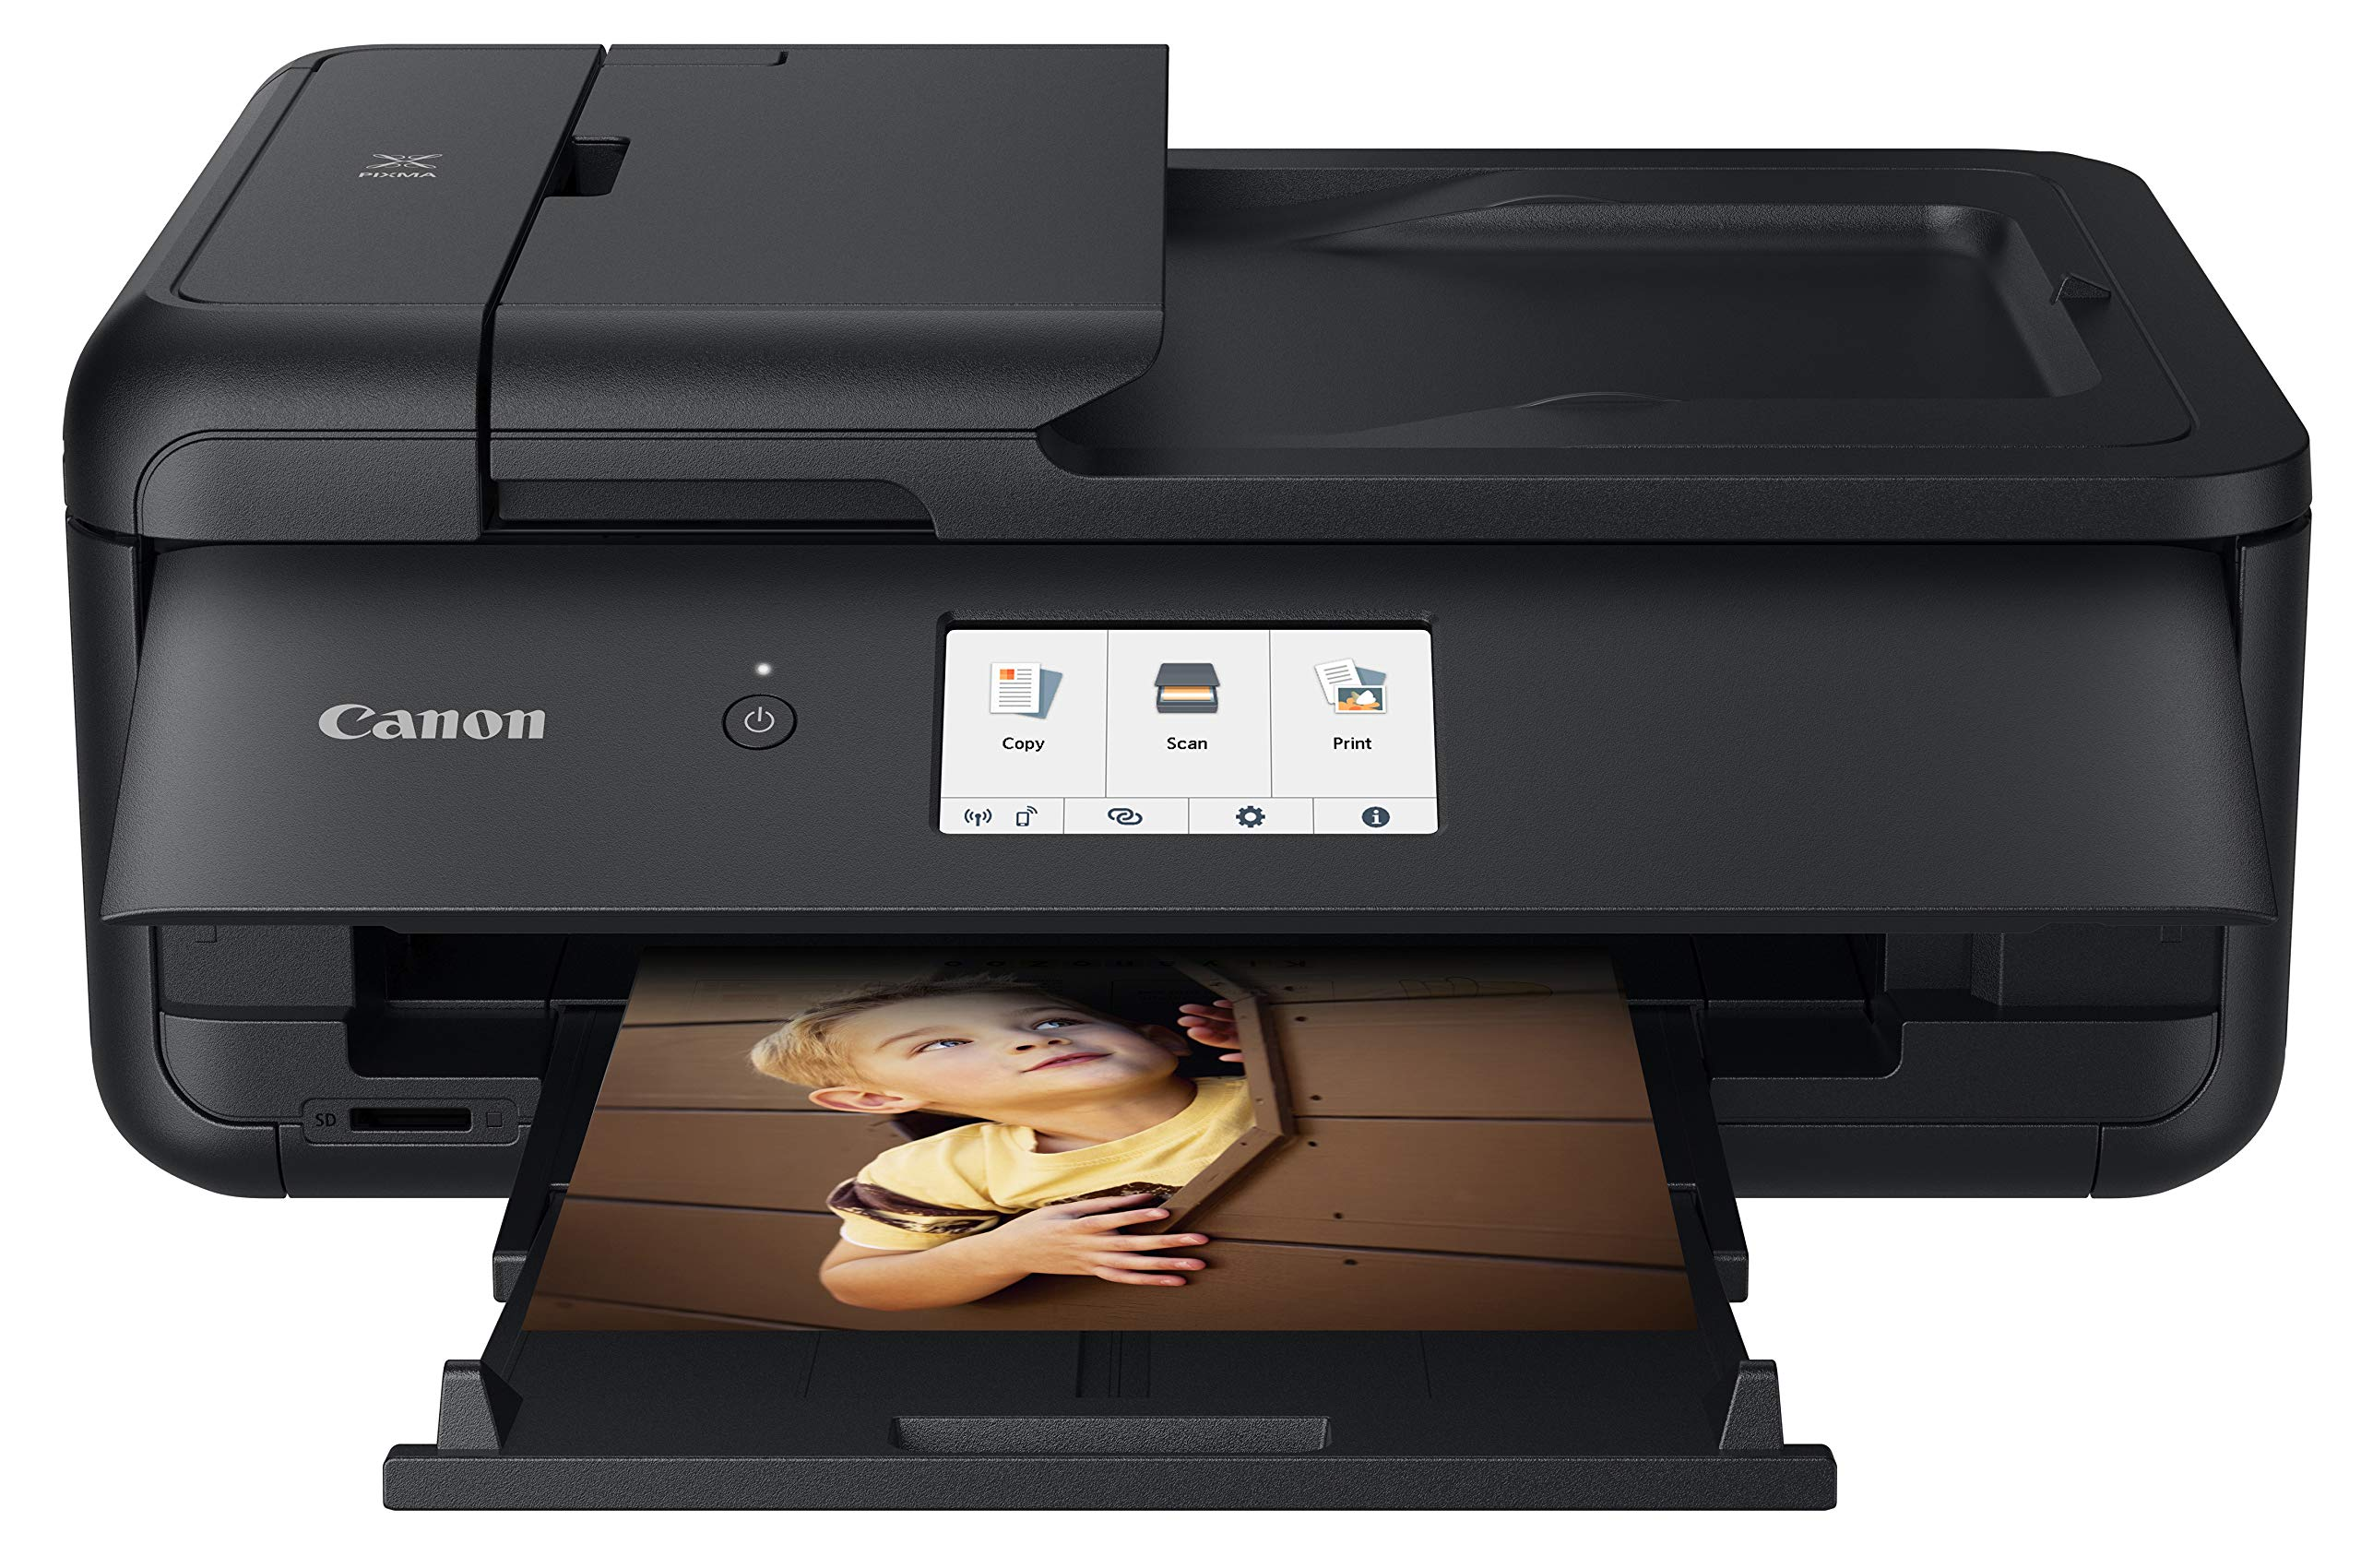 Canon Wireless Scannier Printing AirPrint